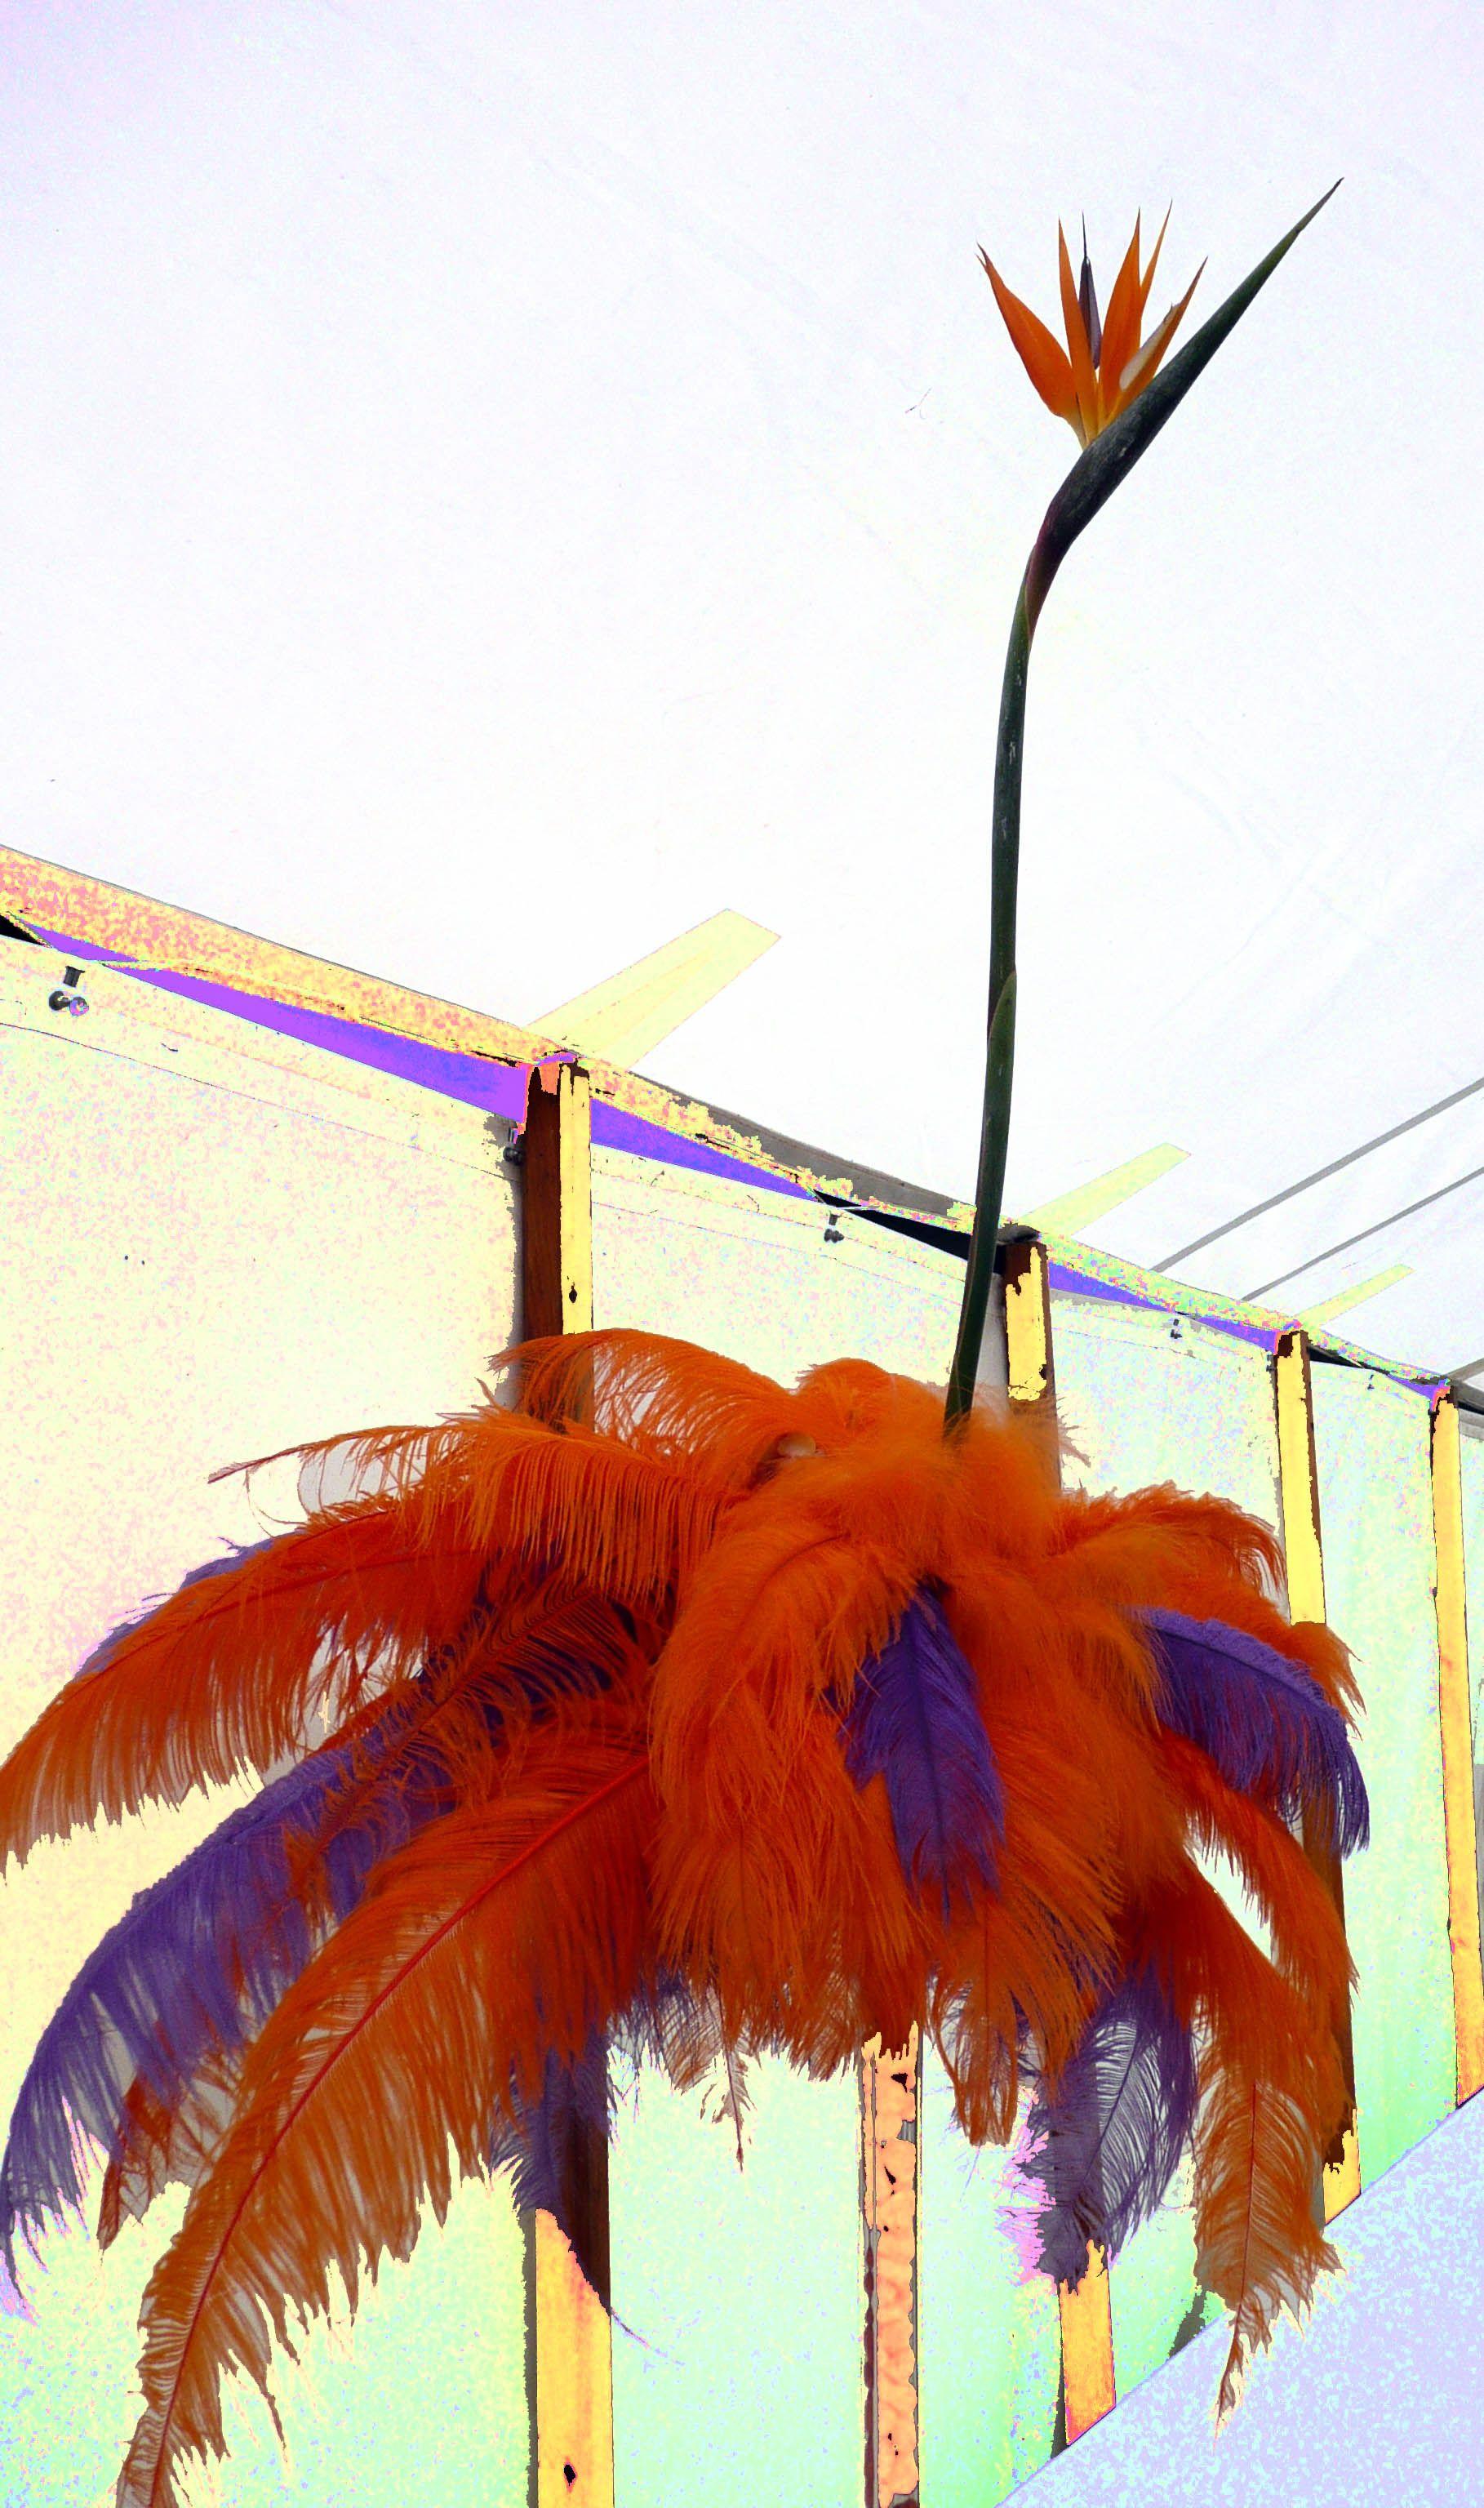 Halifax show 2012 - mad flamingo